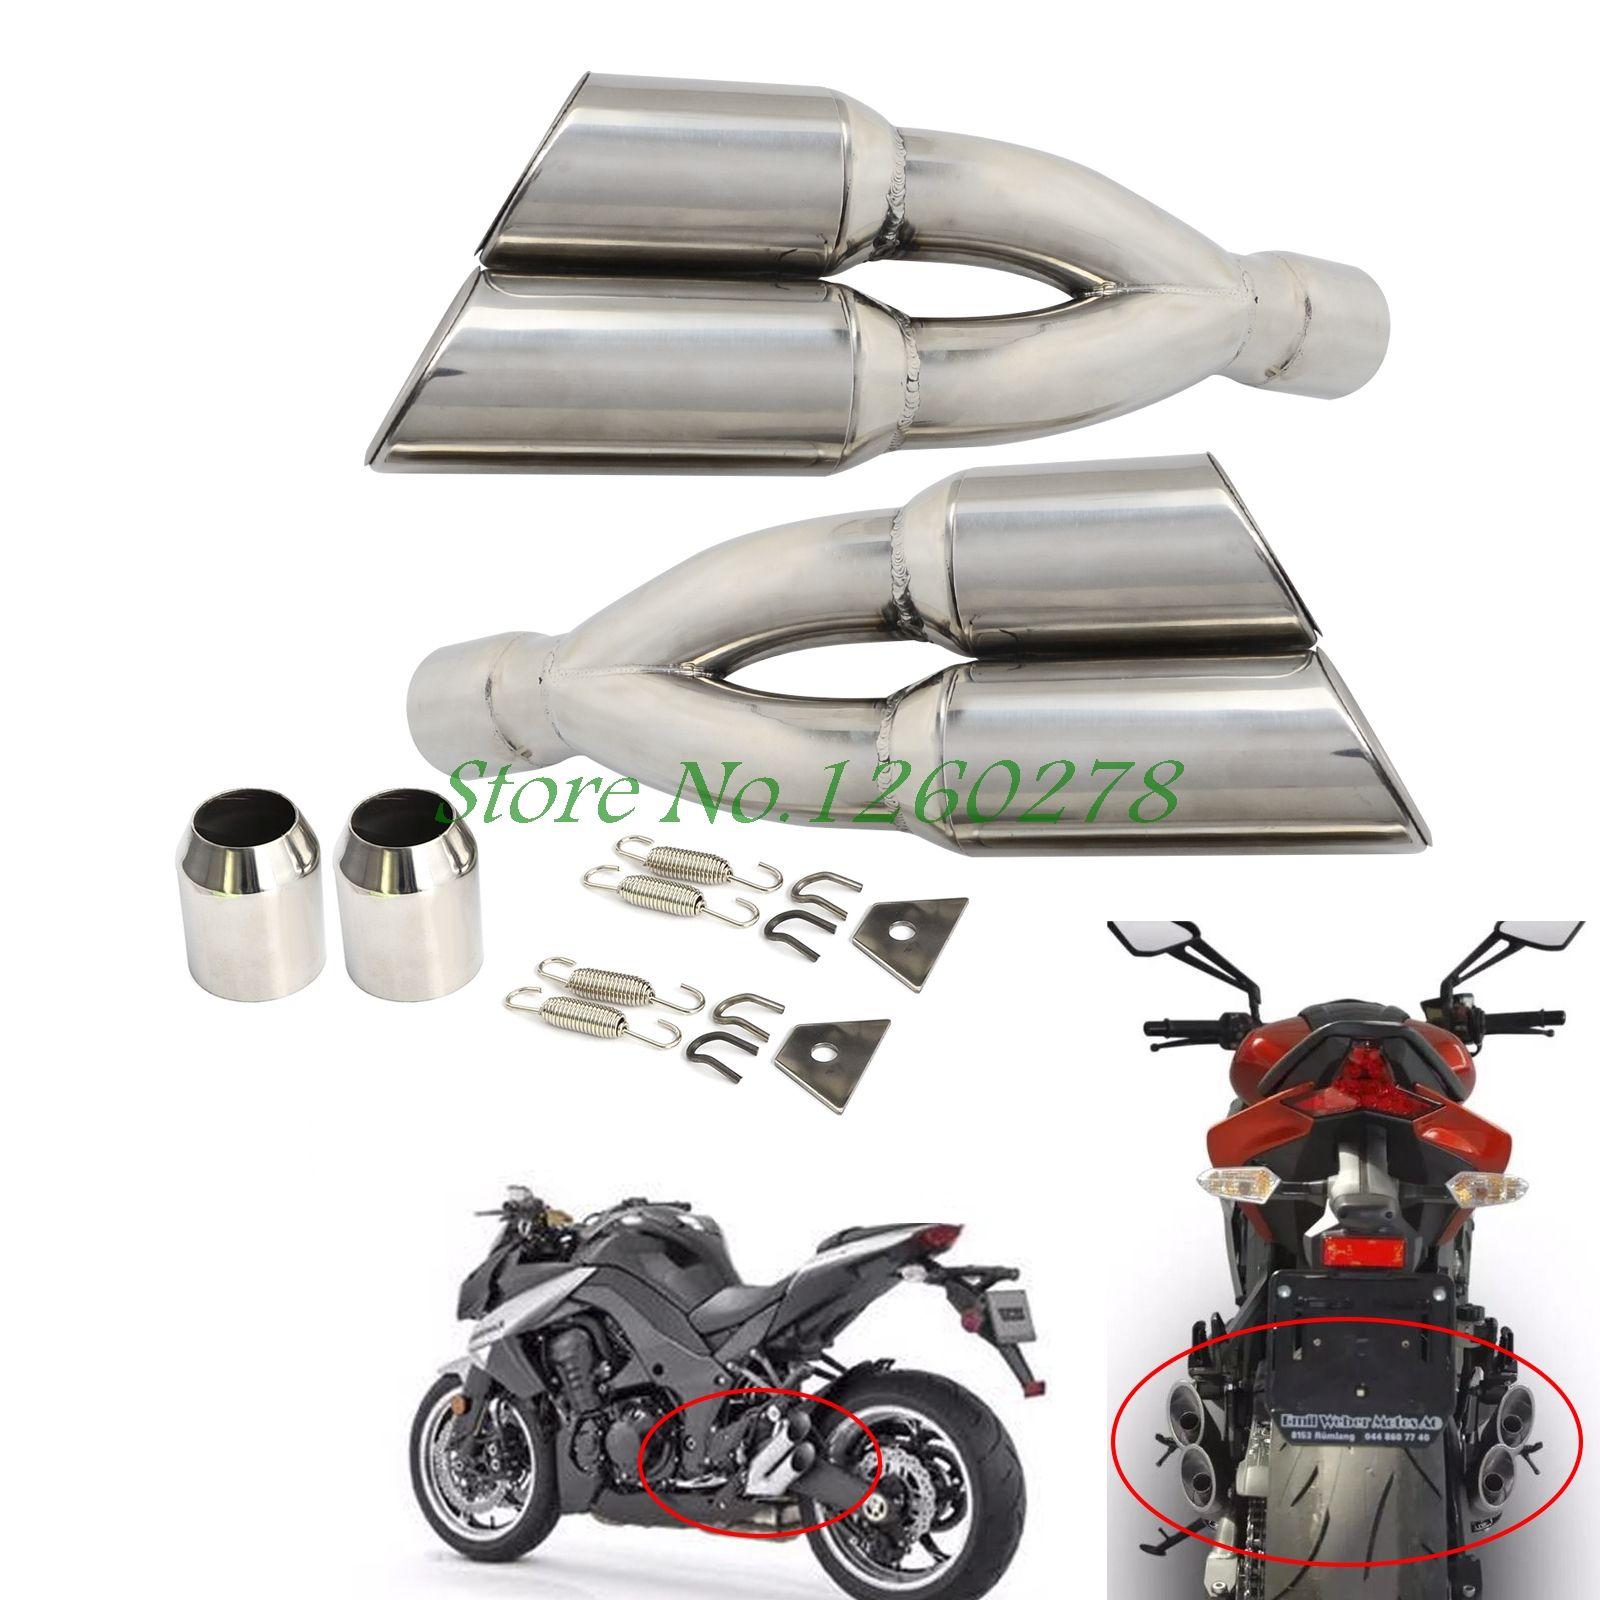 Universal Dual Exhaust Muffler Pipe Slip On For Motorcycle Motocross Supermoto Street Bike Scooter ATV Quad Dirt Bike Off Road